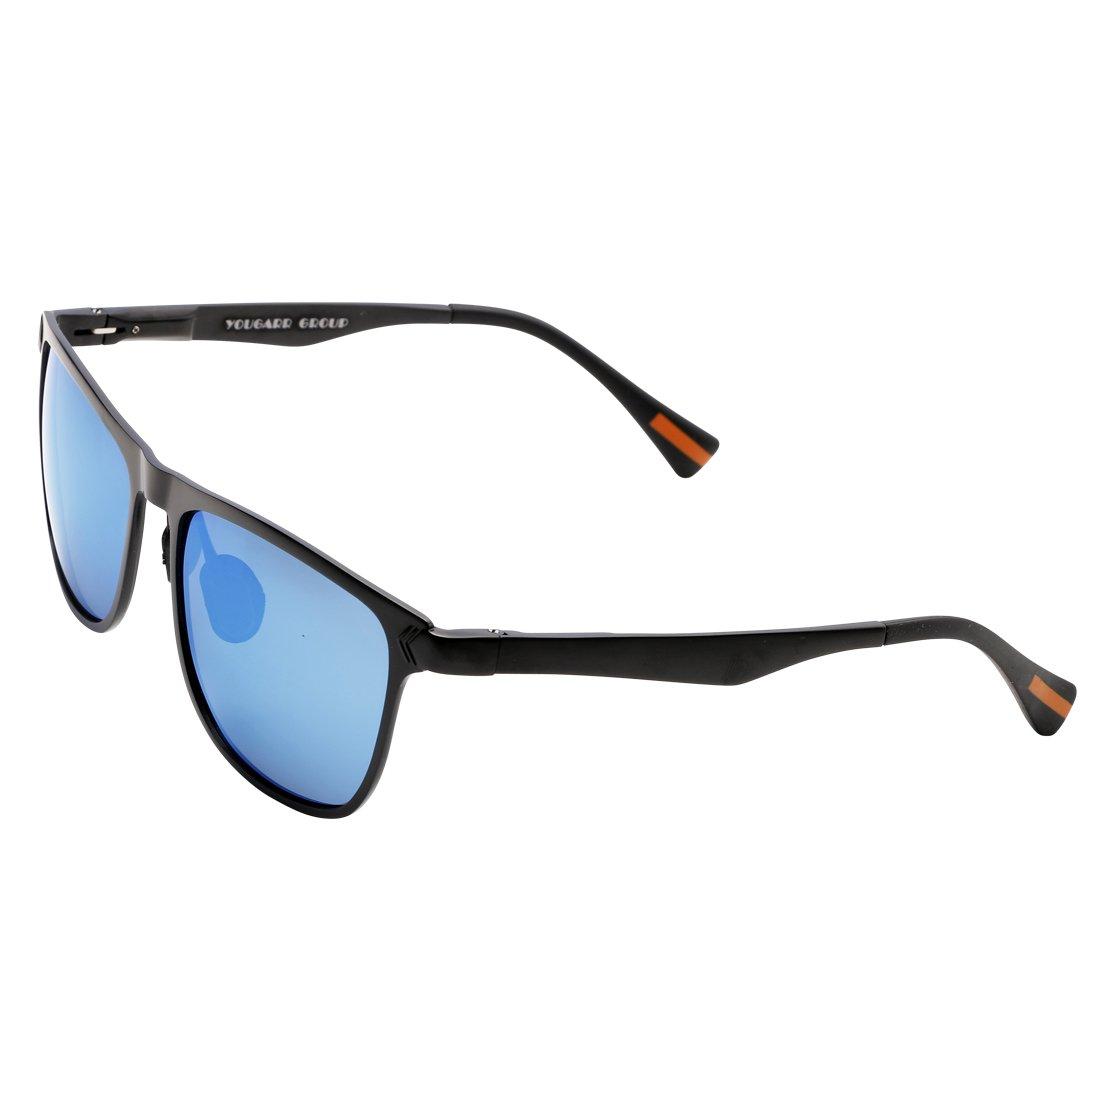 37c2c70530d94 Galleon - Yougarr Group Retro Wayfarer Sunglasses Polarized Metal Frame  Classic Vintage Design For Men Women (Blue Len Black Frame